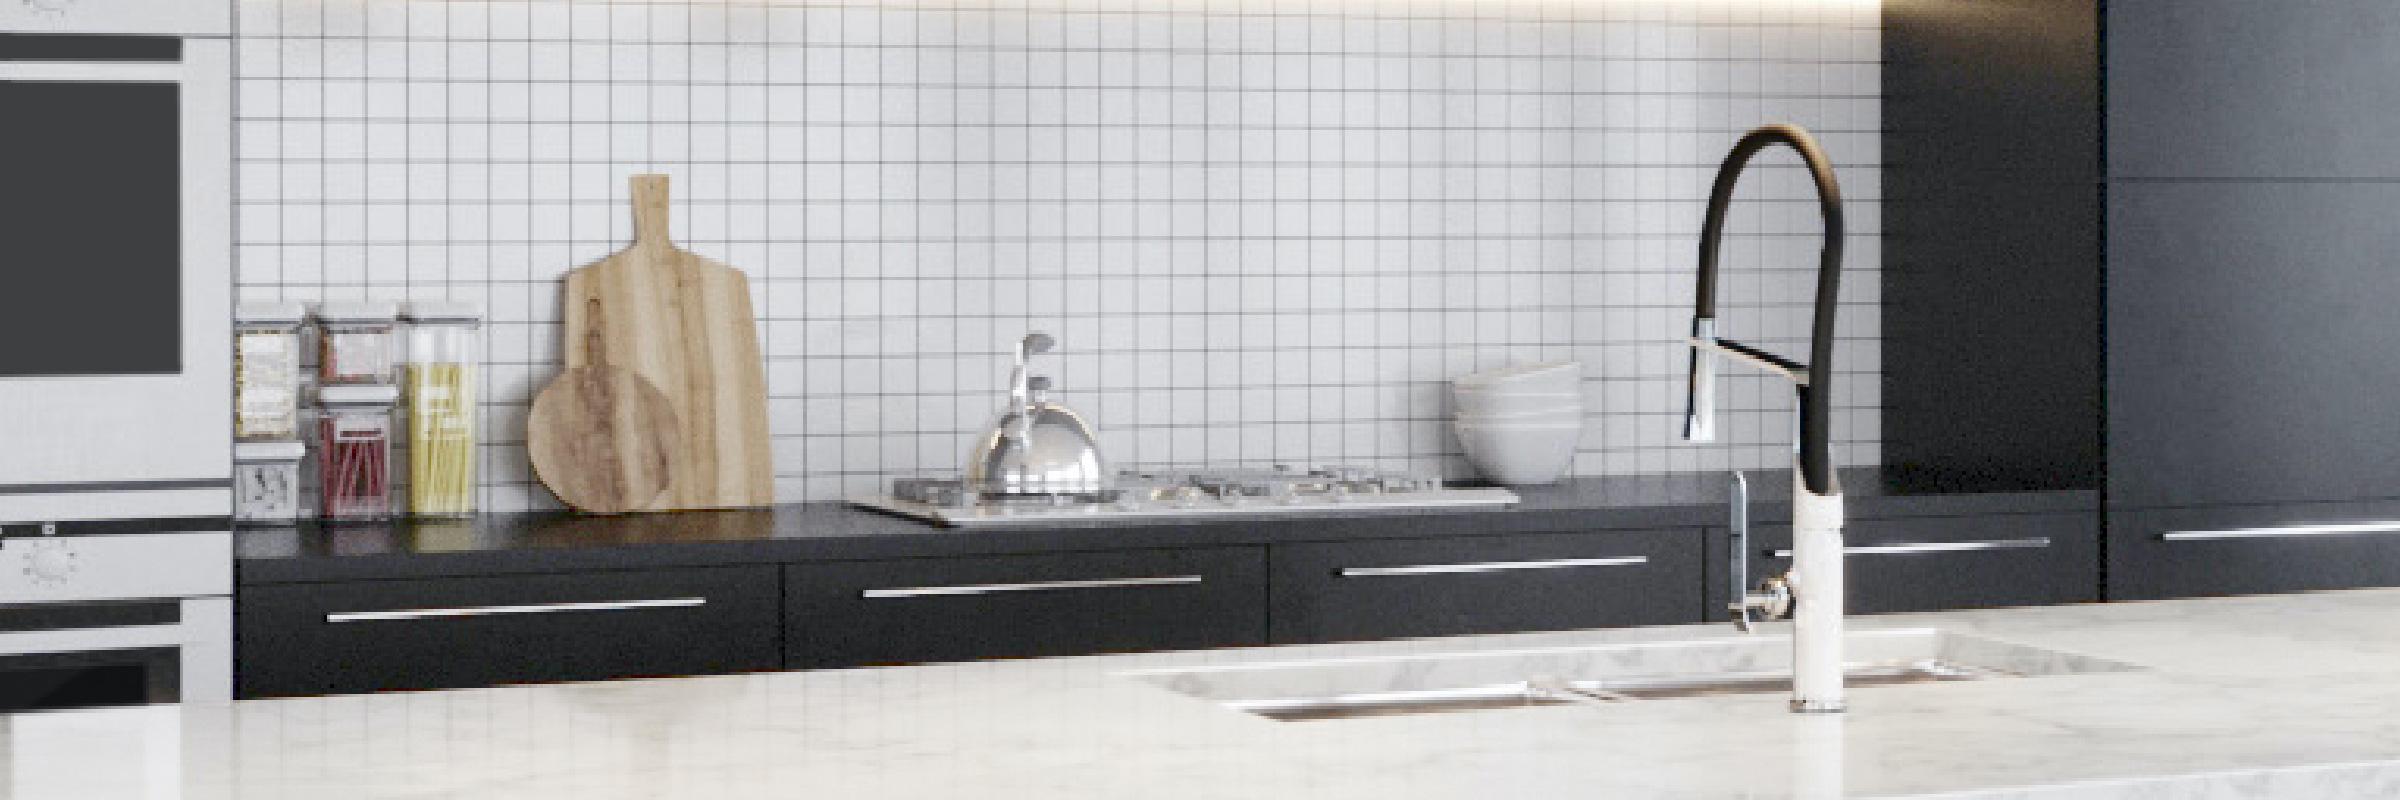 low flow faucets at kitchen bath classics